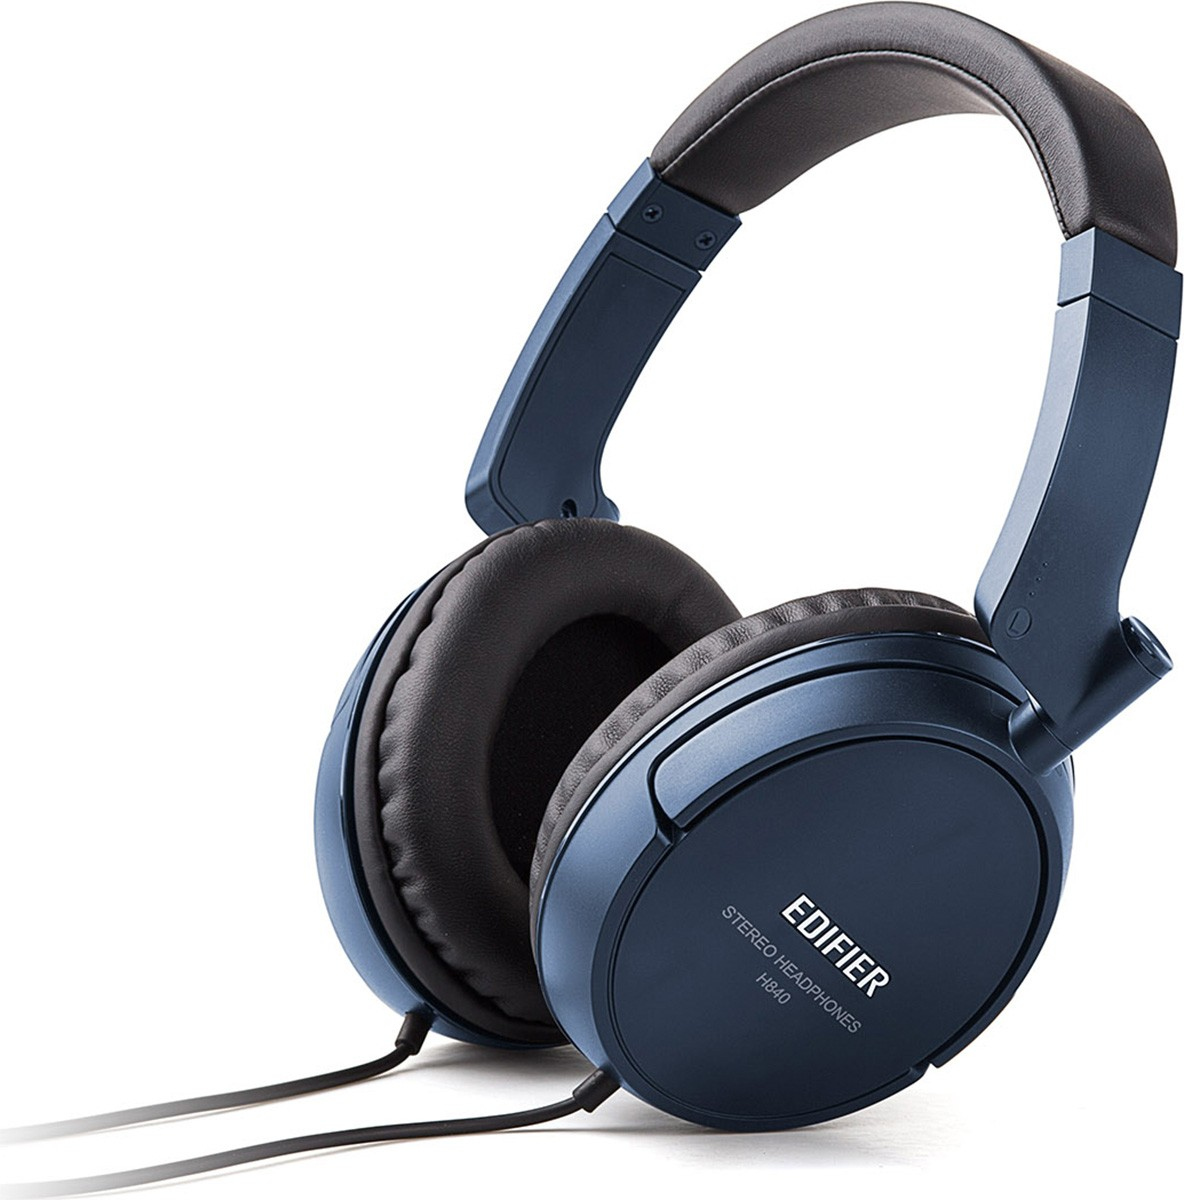 Edifier H840 Fone de Ouvido Profissional, Azul